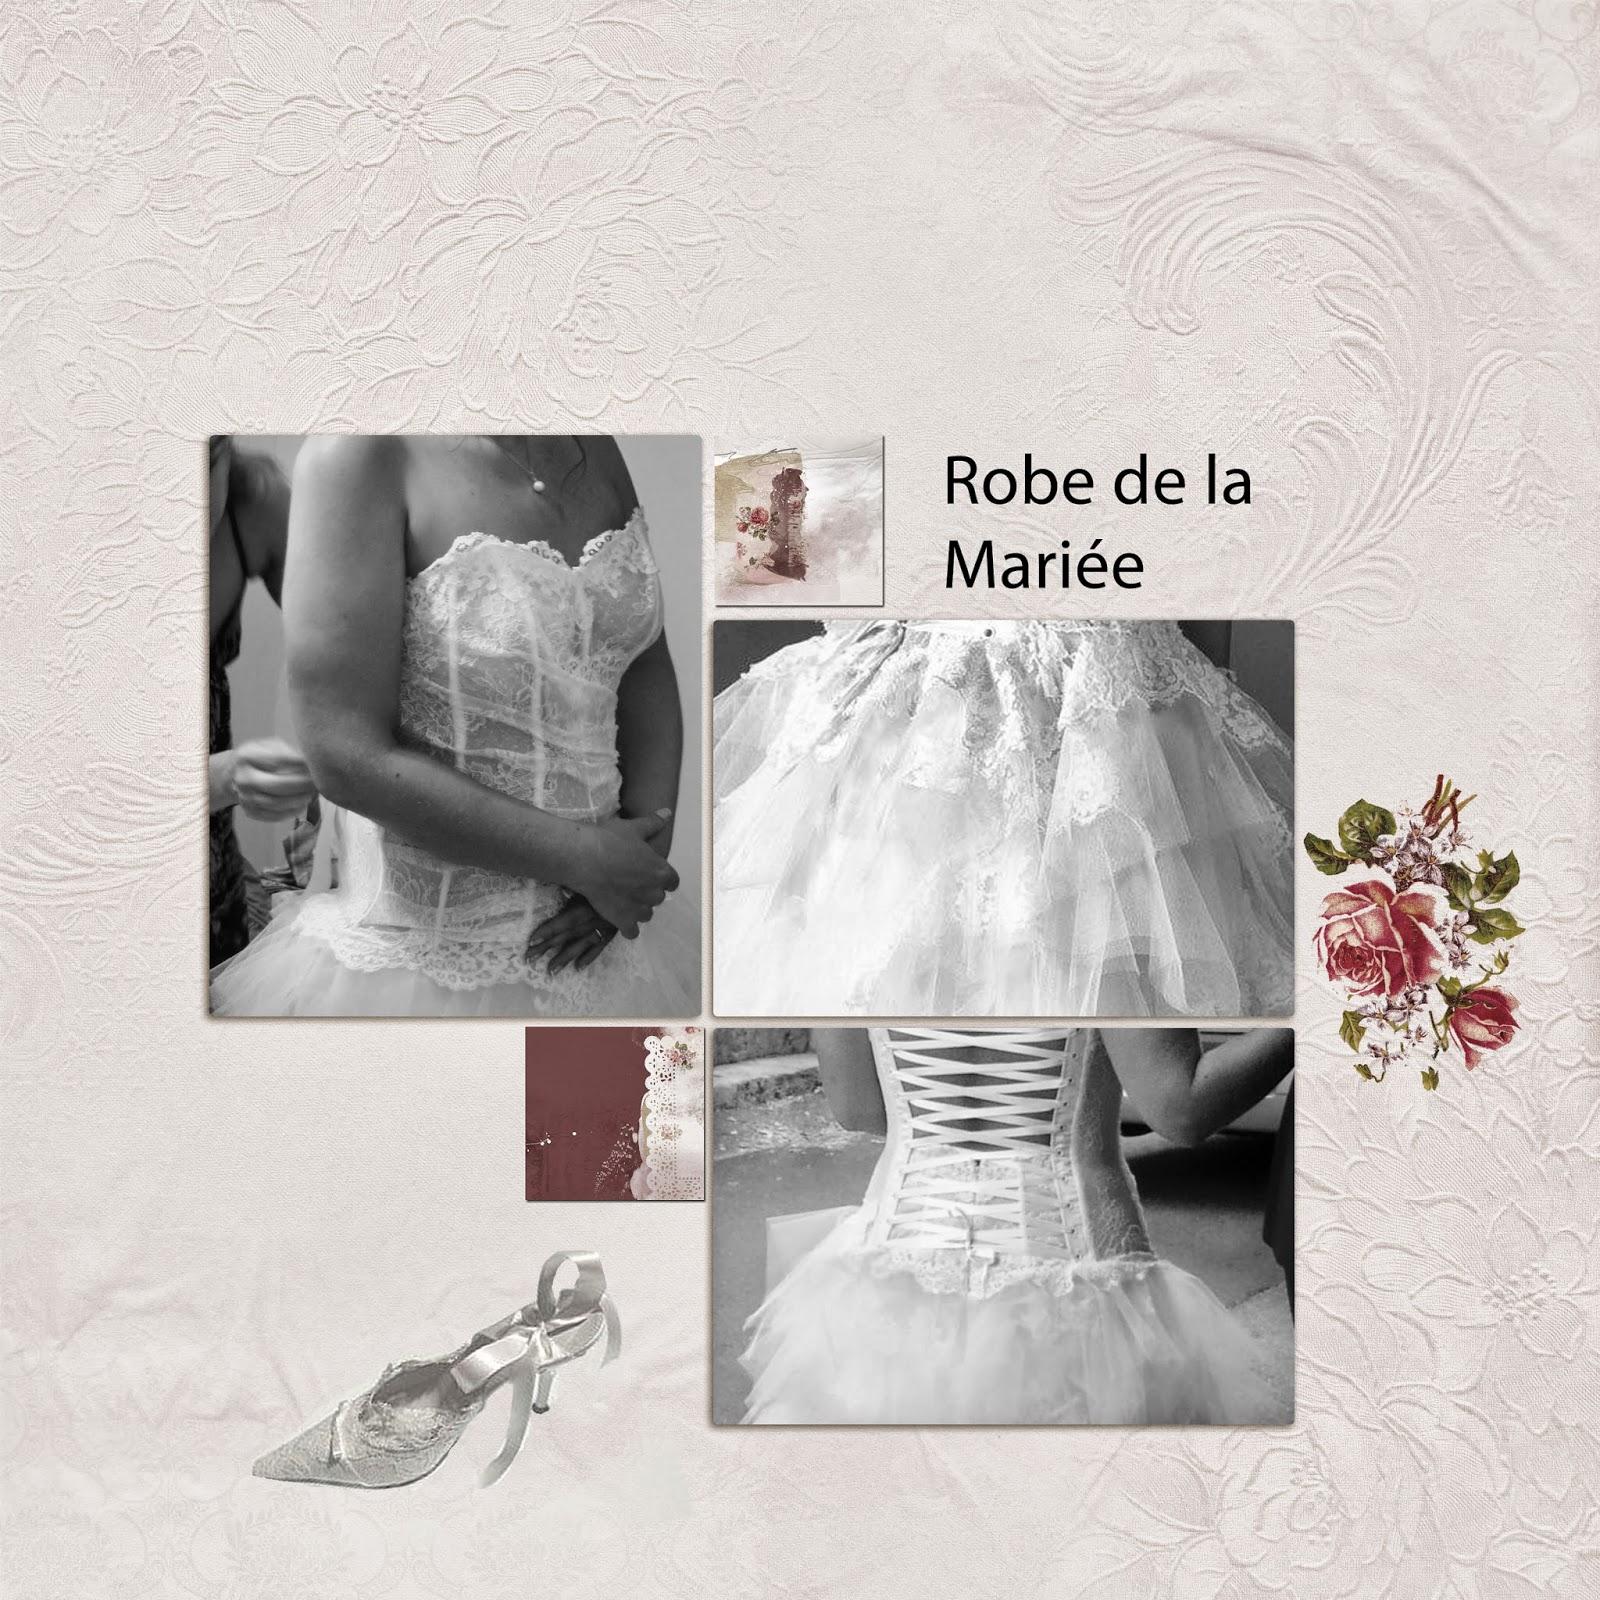 Le scrapbooking de martinascrap robe mari e for Robes de mariage cyber lundi